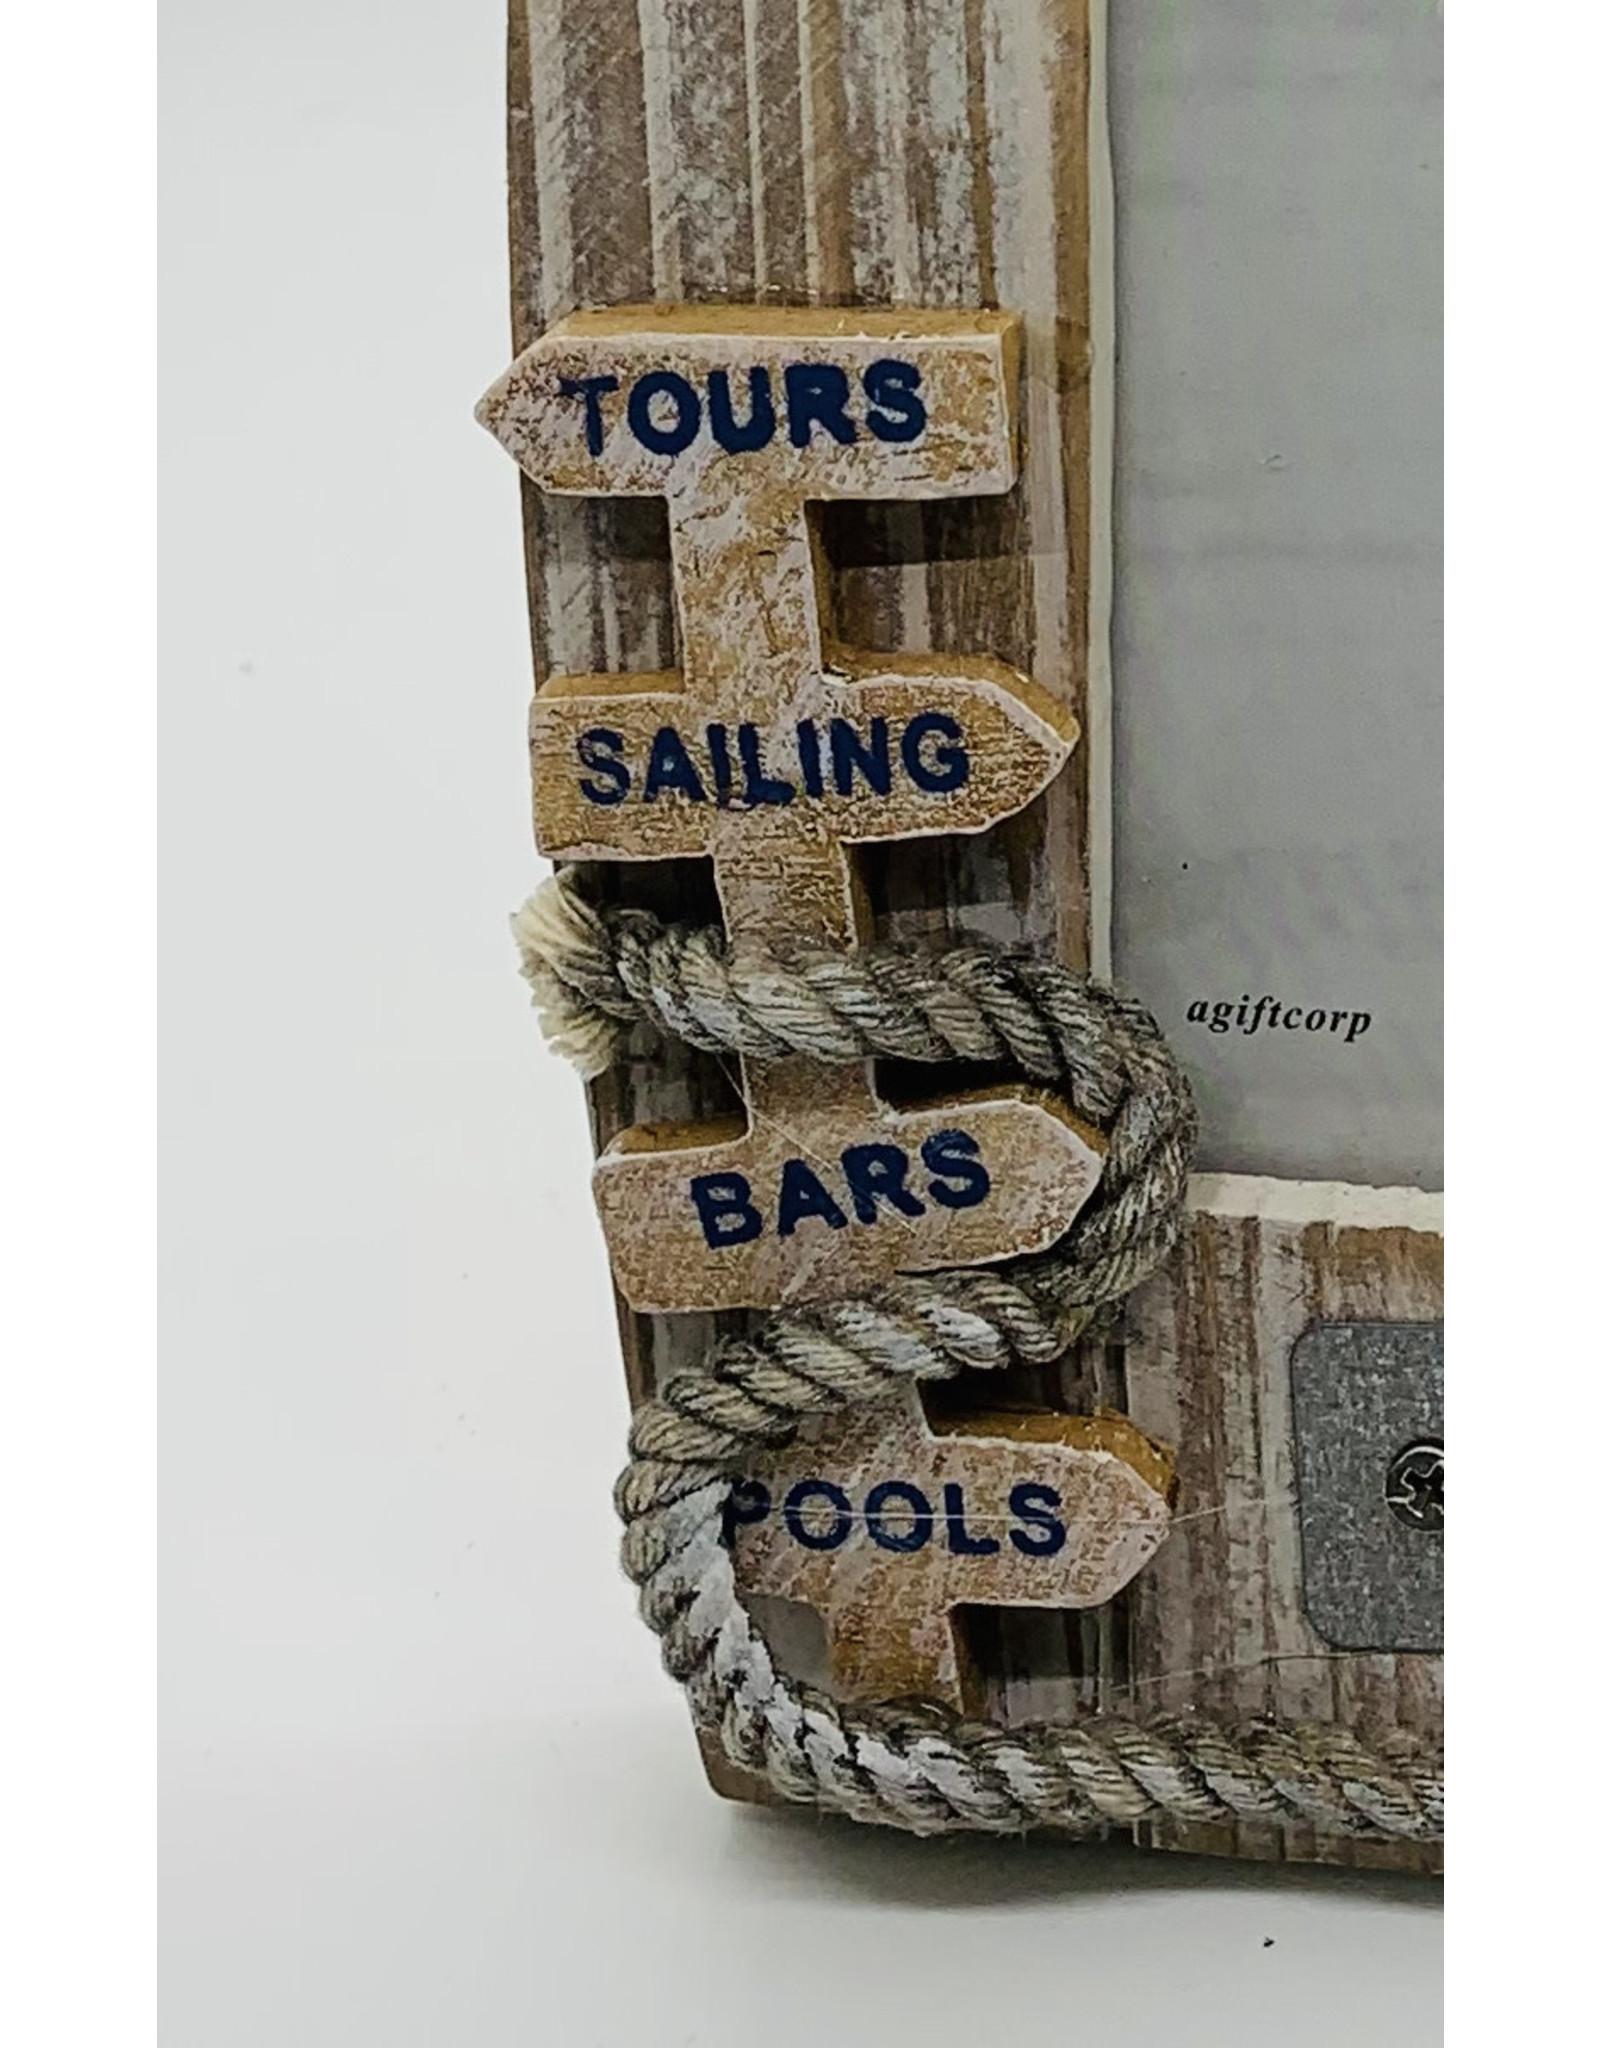 California Seashell company HB BOAT TOUR 5x7 FRAME